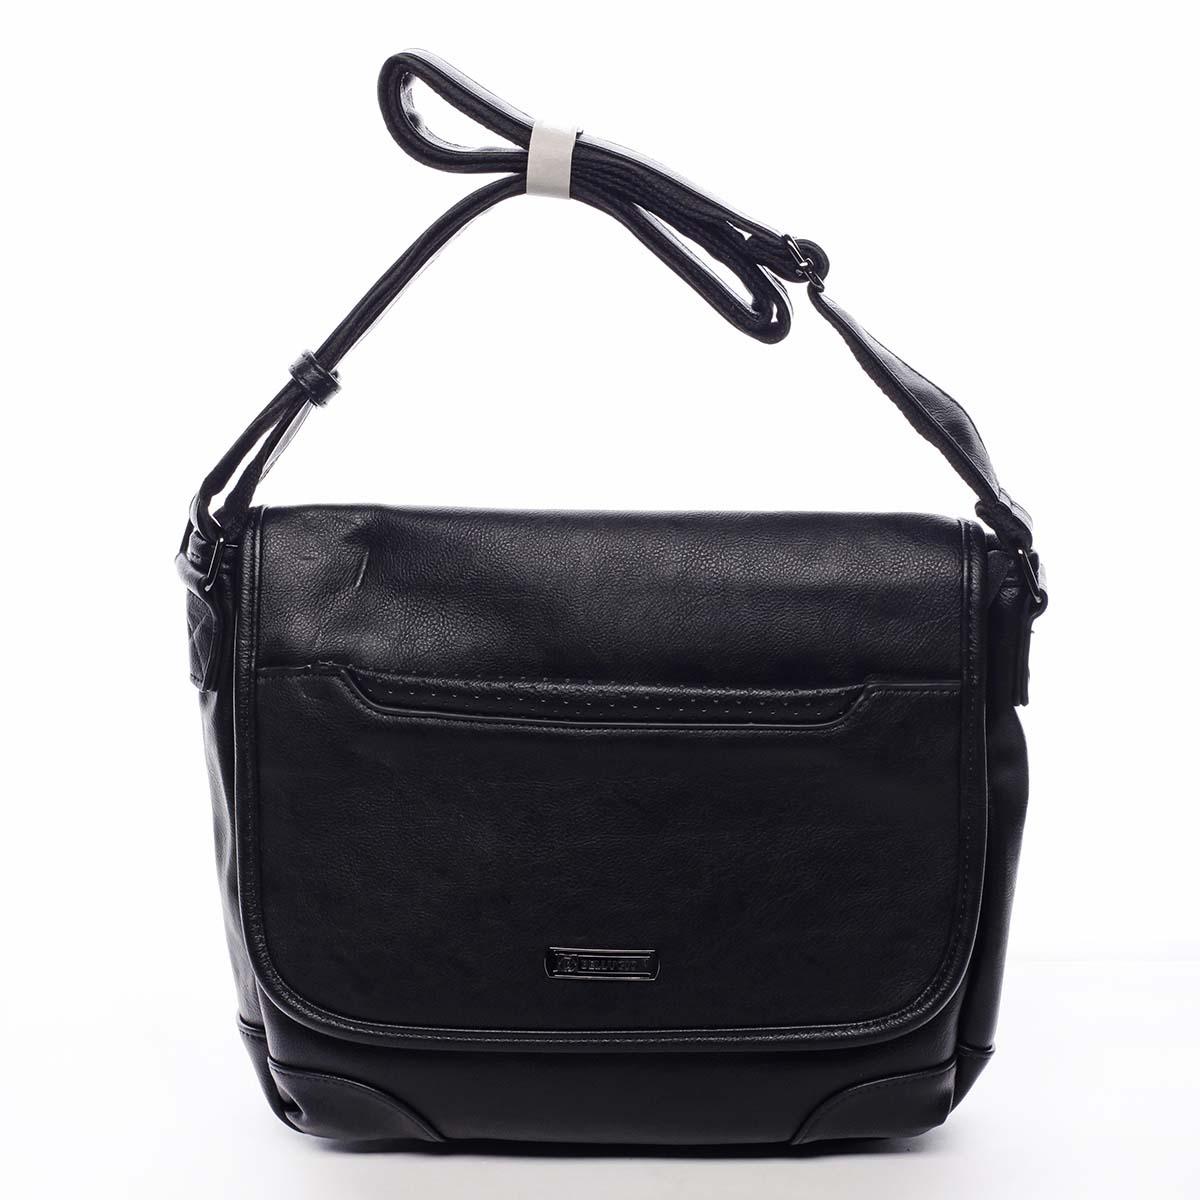 Pánska crossbody taška čierna - Bellugio Yanis